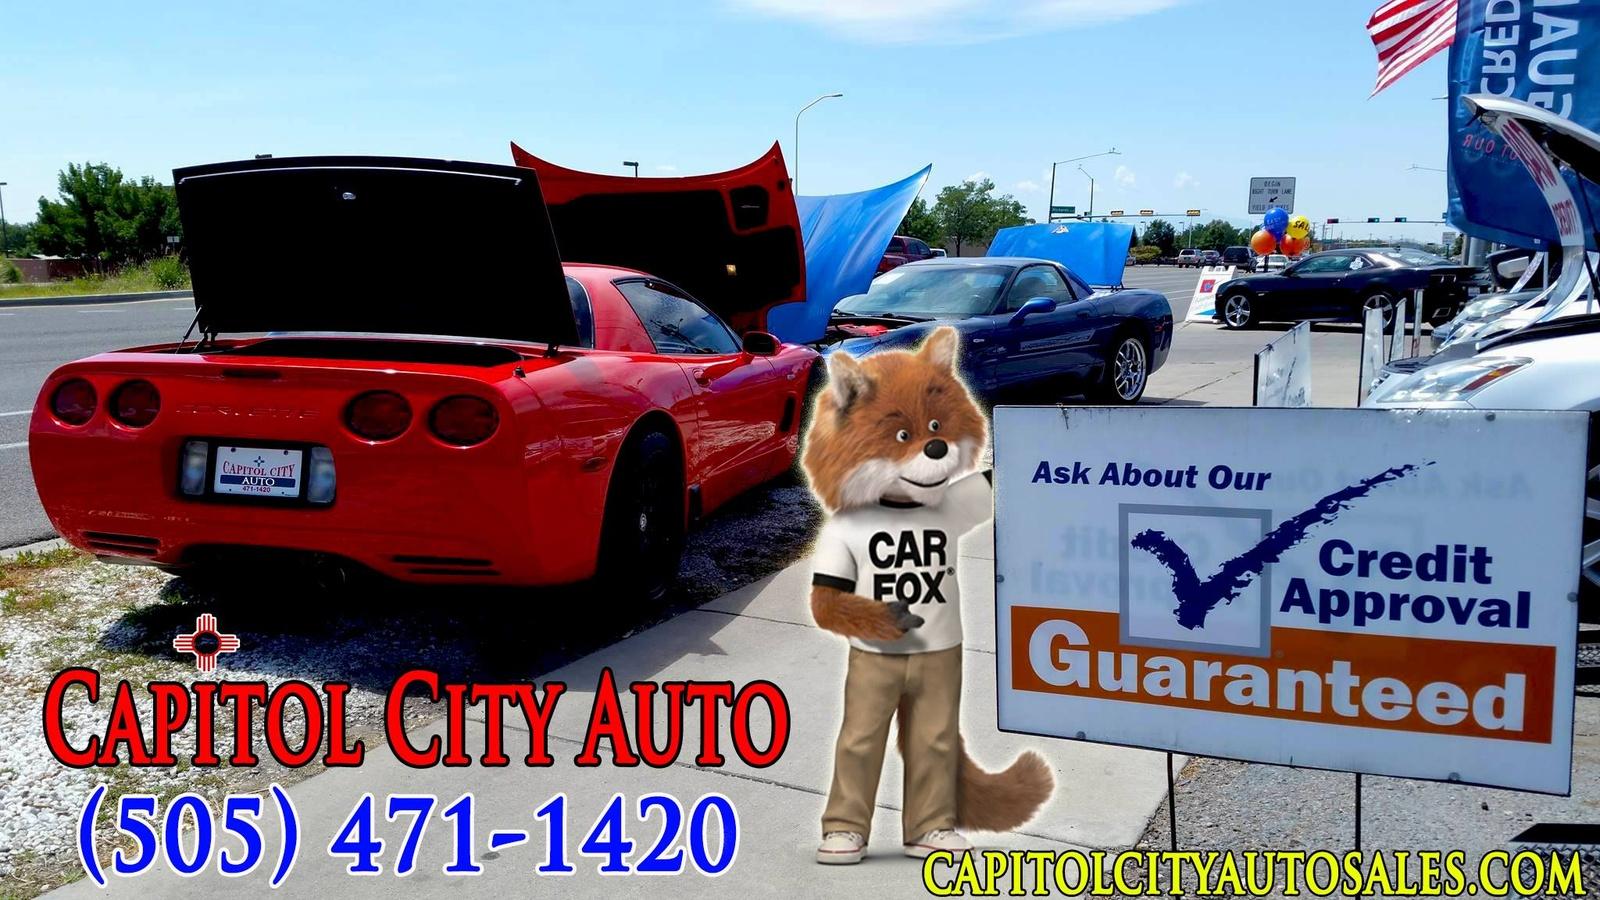 Capitol City Auto Santa Fe Nm Read Consumer Reviews